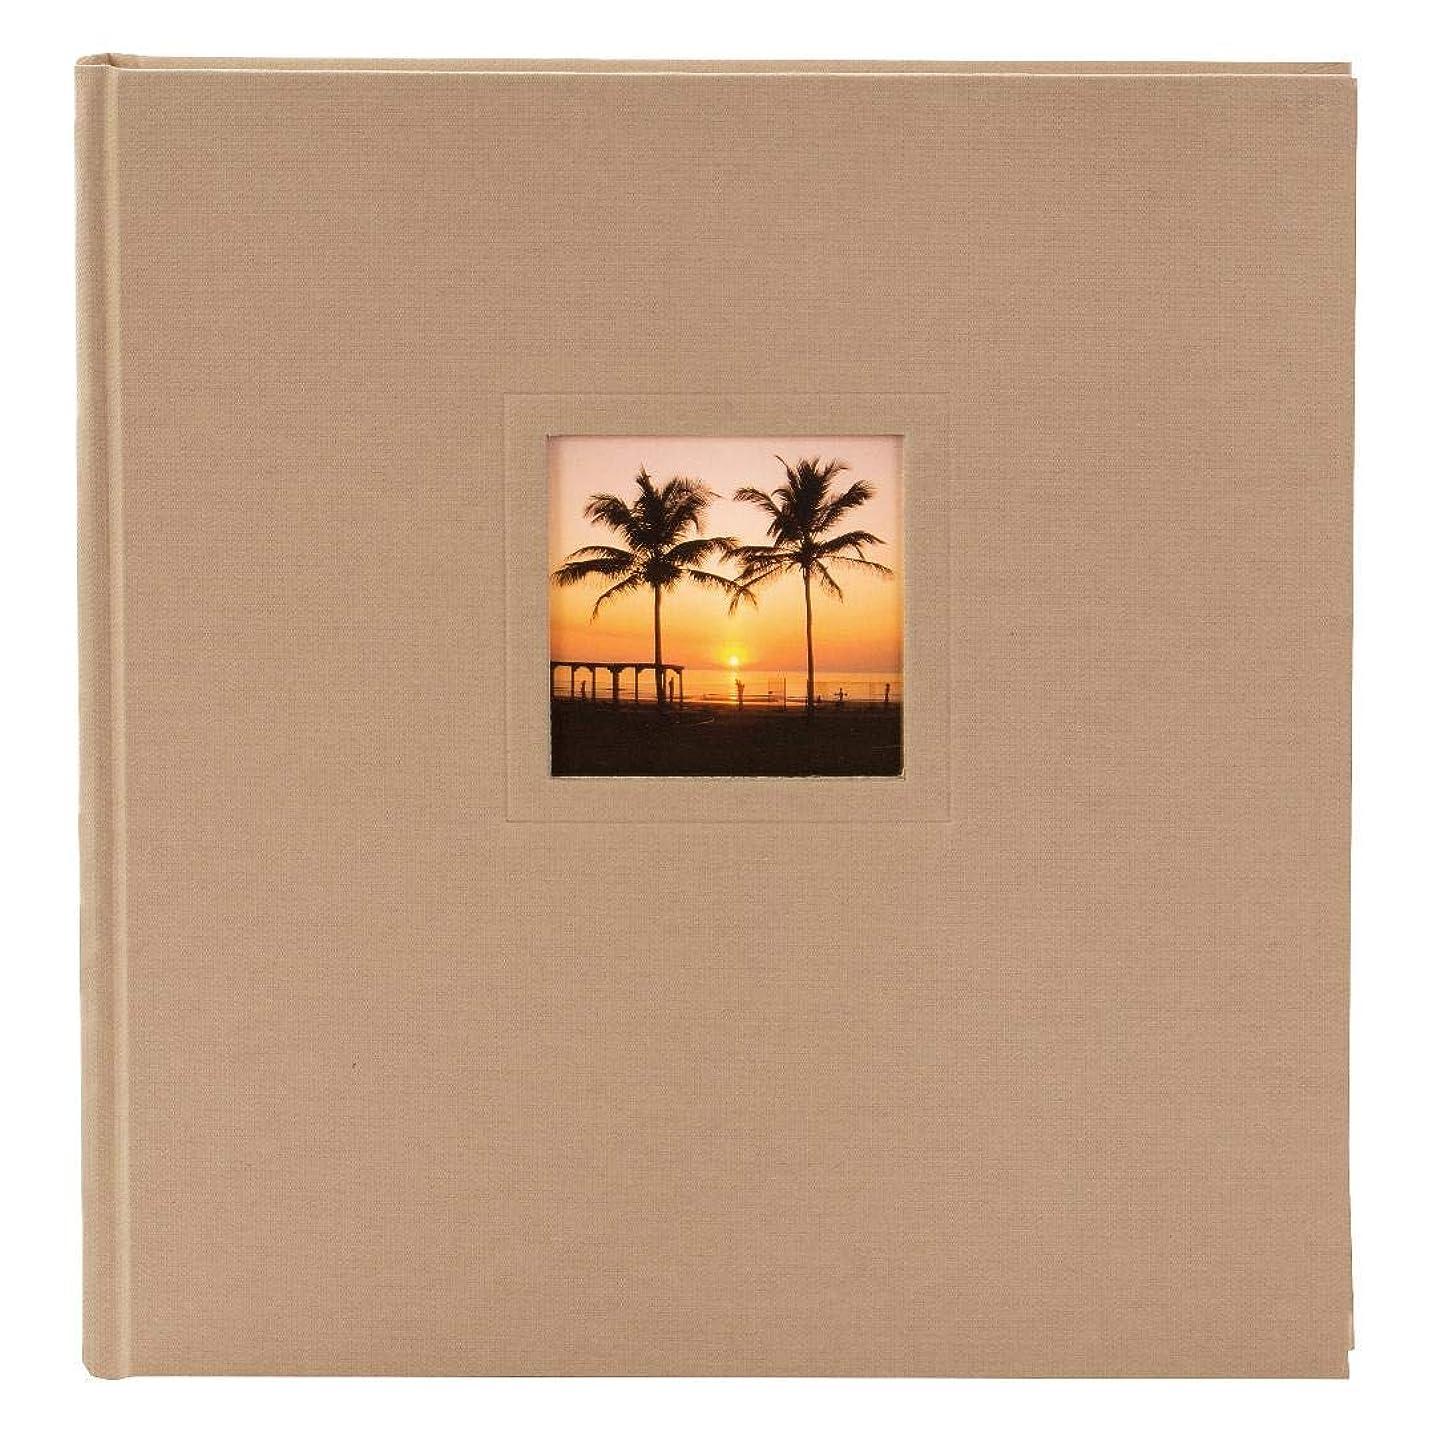 Goldbuch Photo Album, 30?x 31?cm Natura, 100?White Pages with Pergamine Dividers, Textured Buchbi Ndep Sheet, Beige, 31103